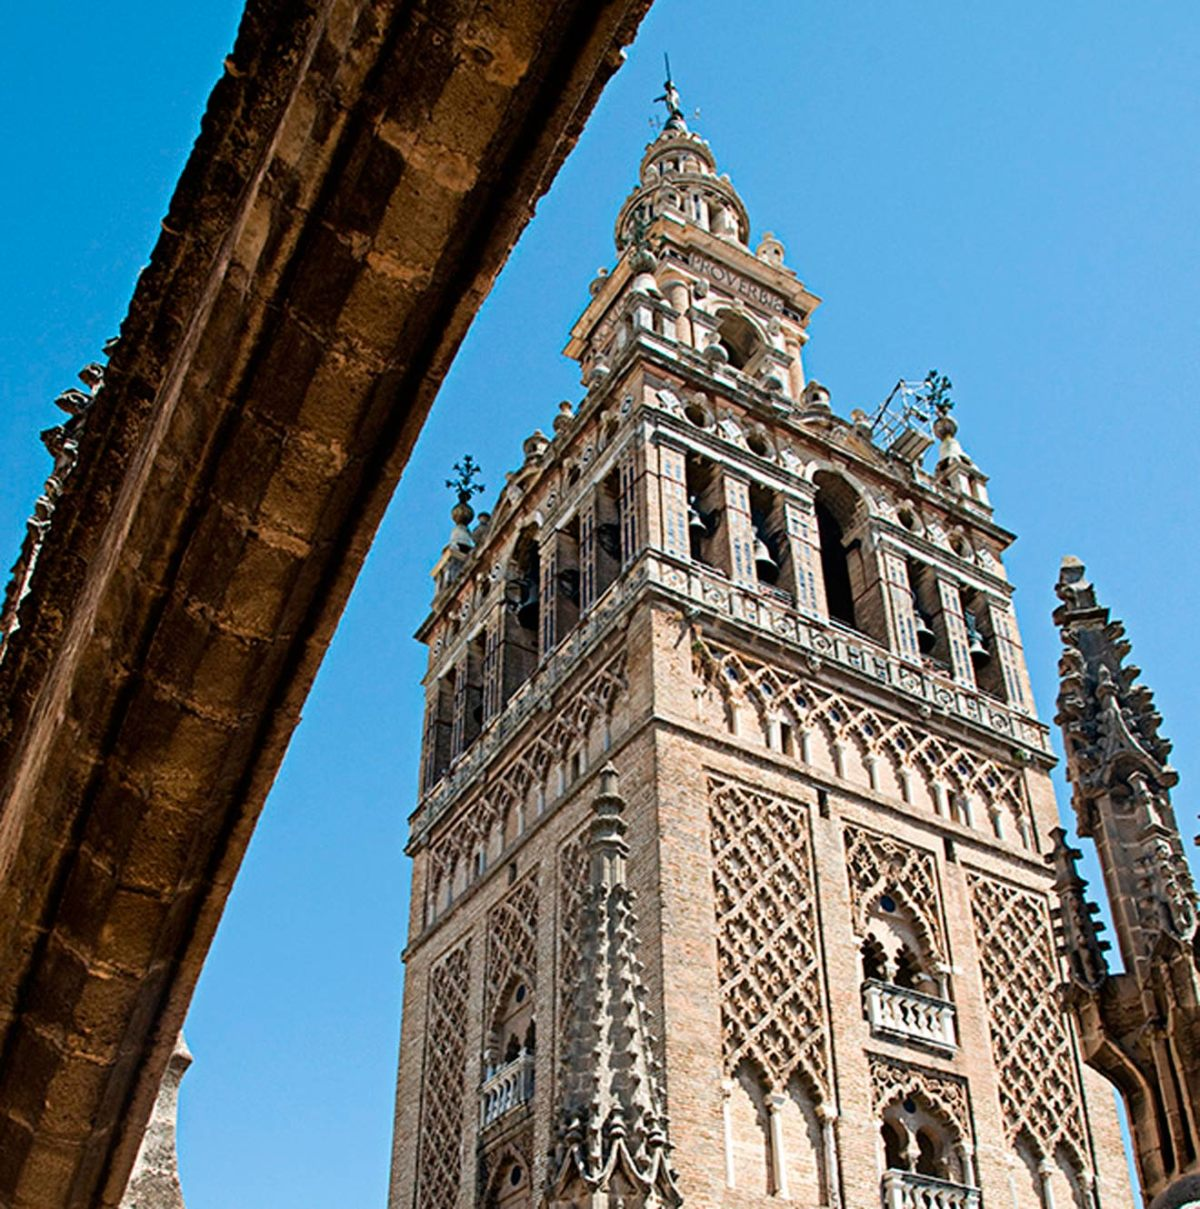 La Giralda / Catedraldesevilla.com